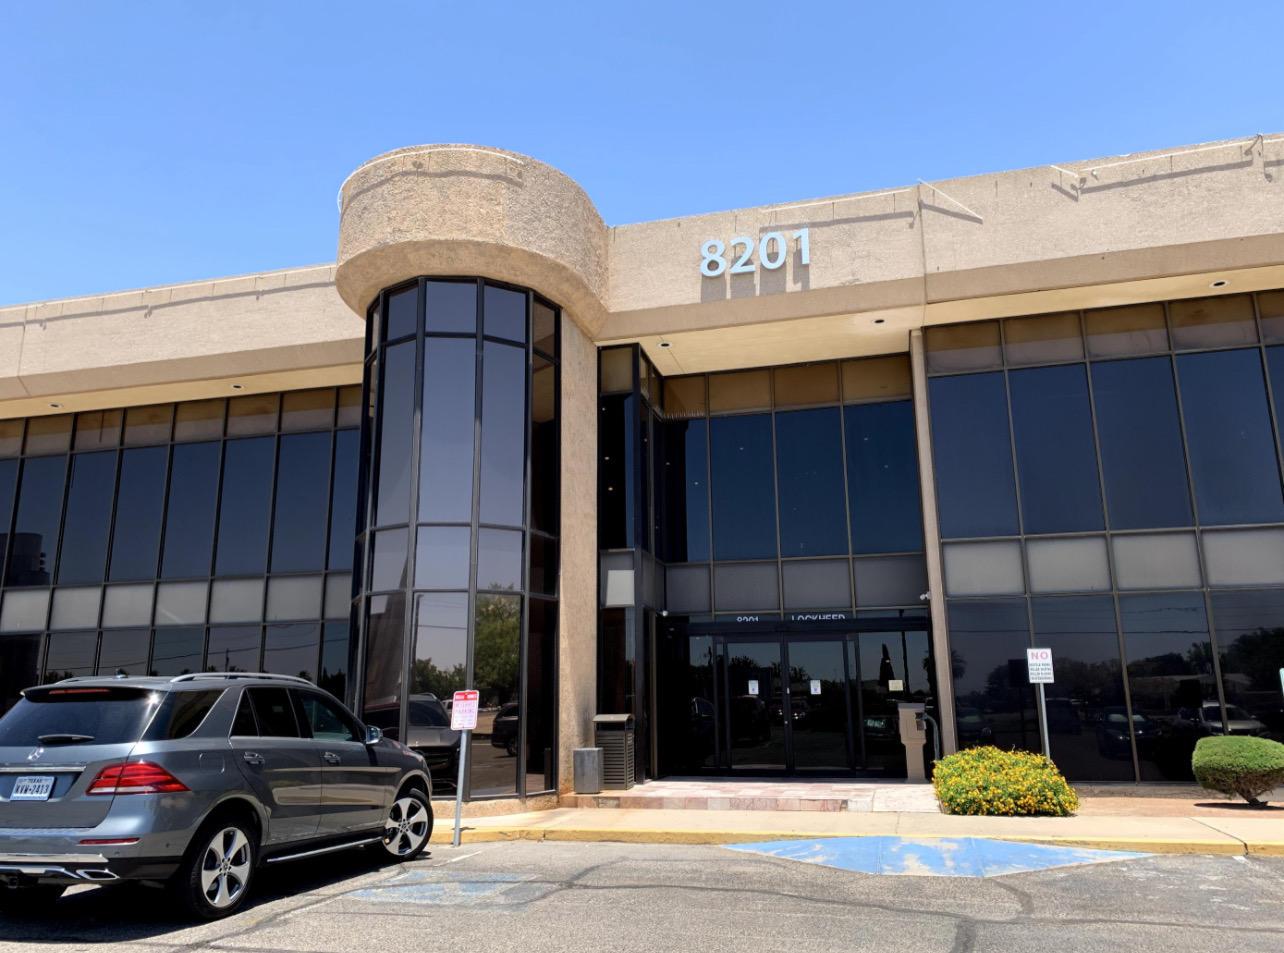 8201 Lockheed Drive, El Paso, Texas 79925, ,Commercial,For sale,Lockheed,838527